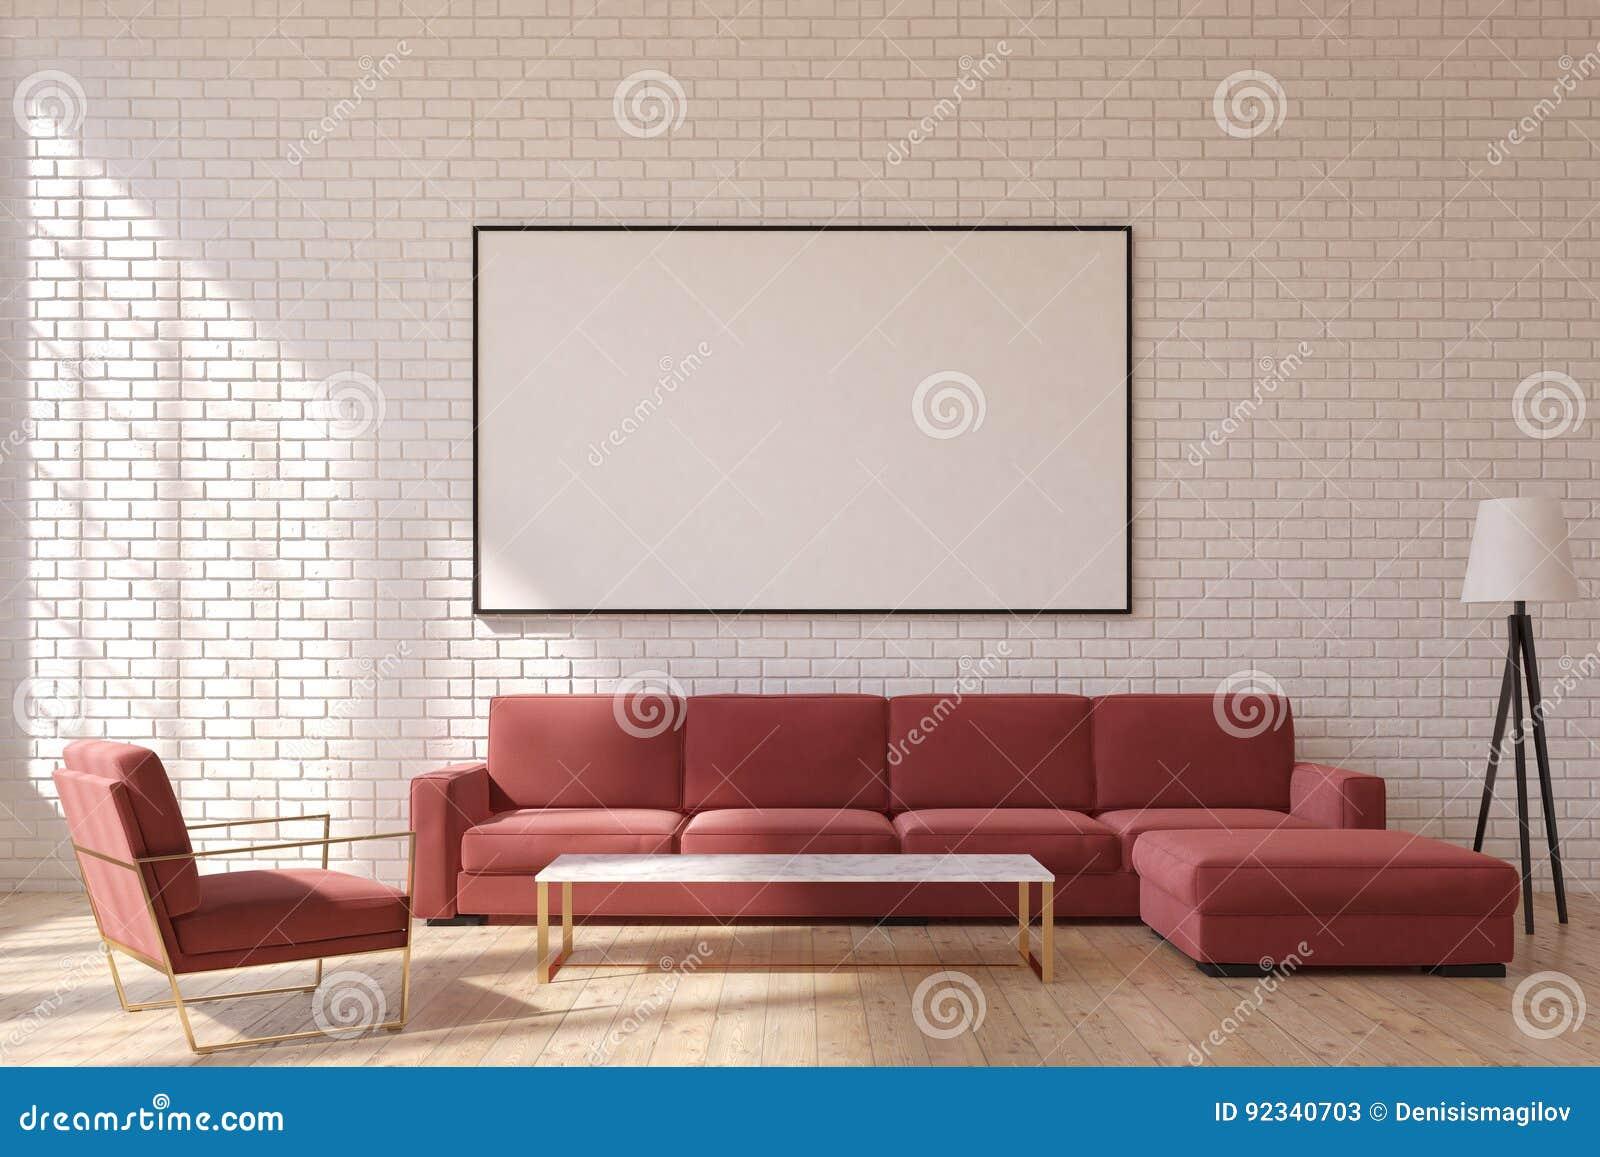 Red living room, front stock illustration. Illustration of ...